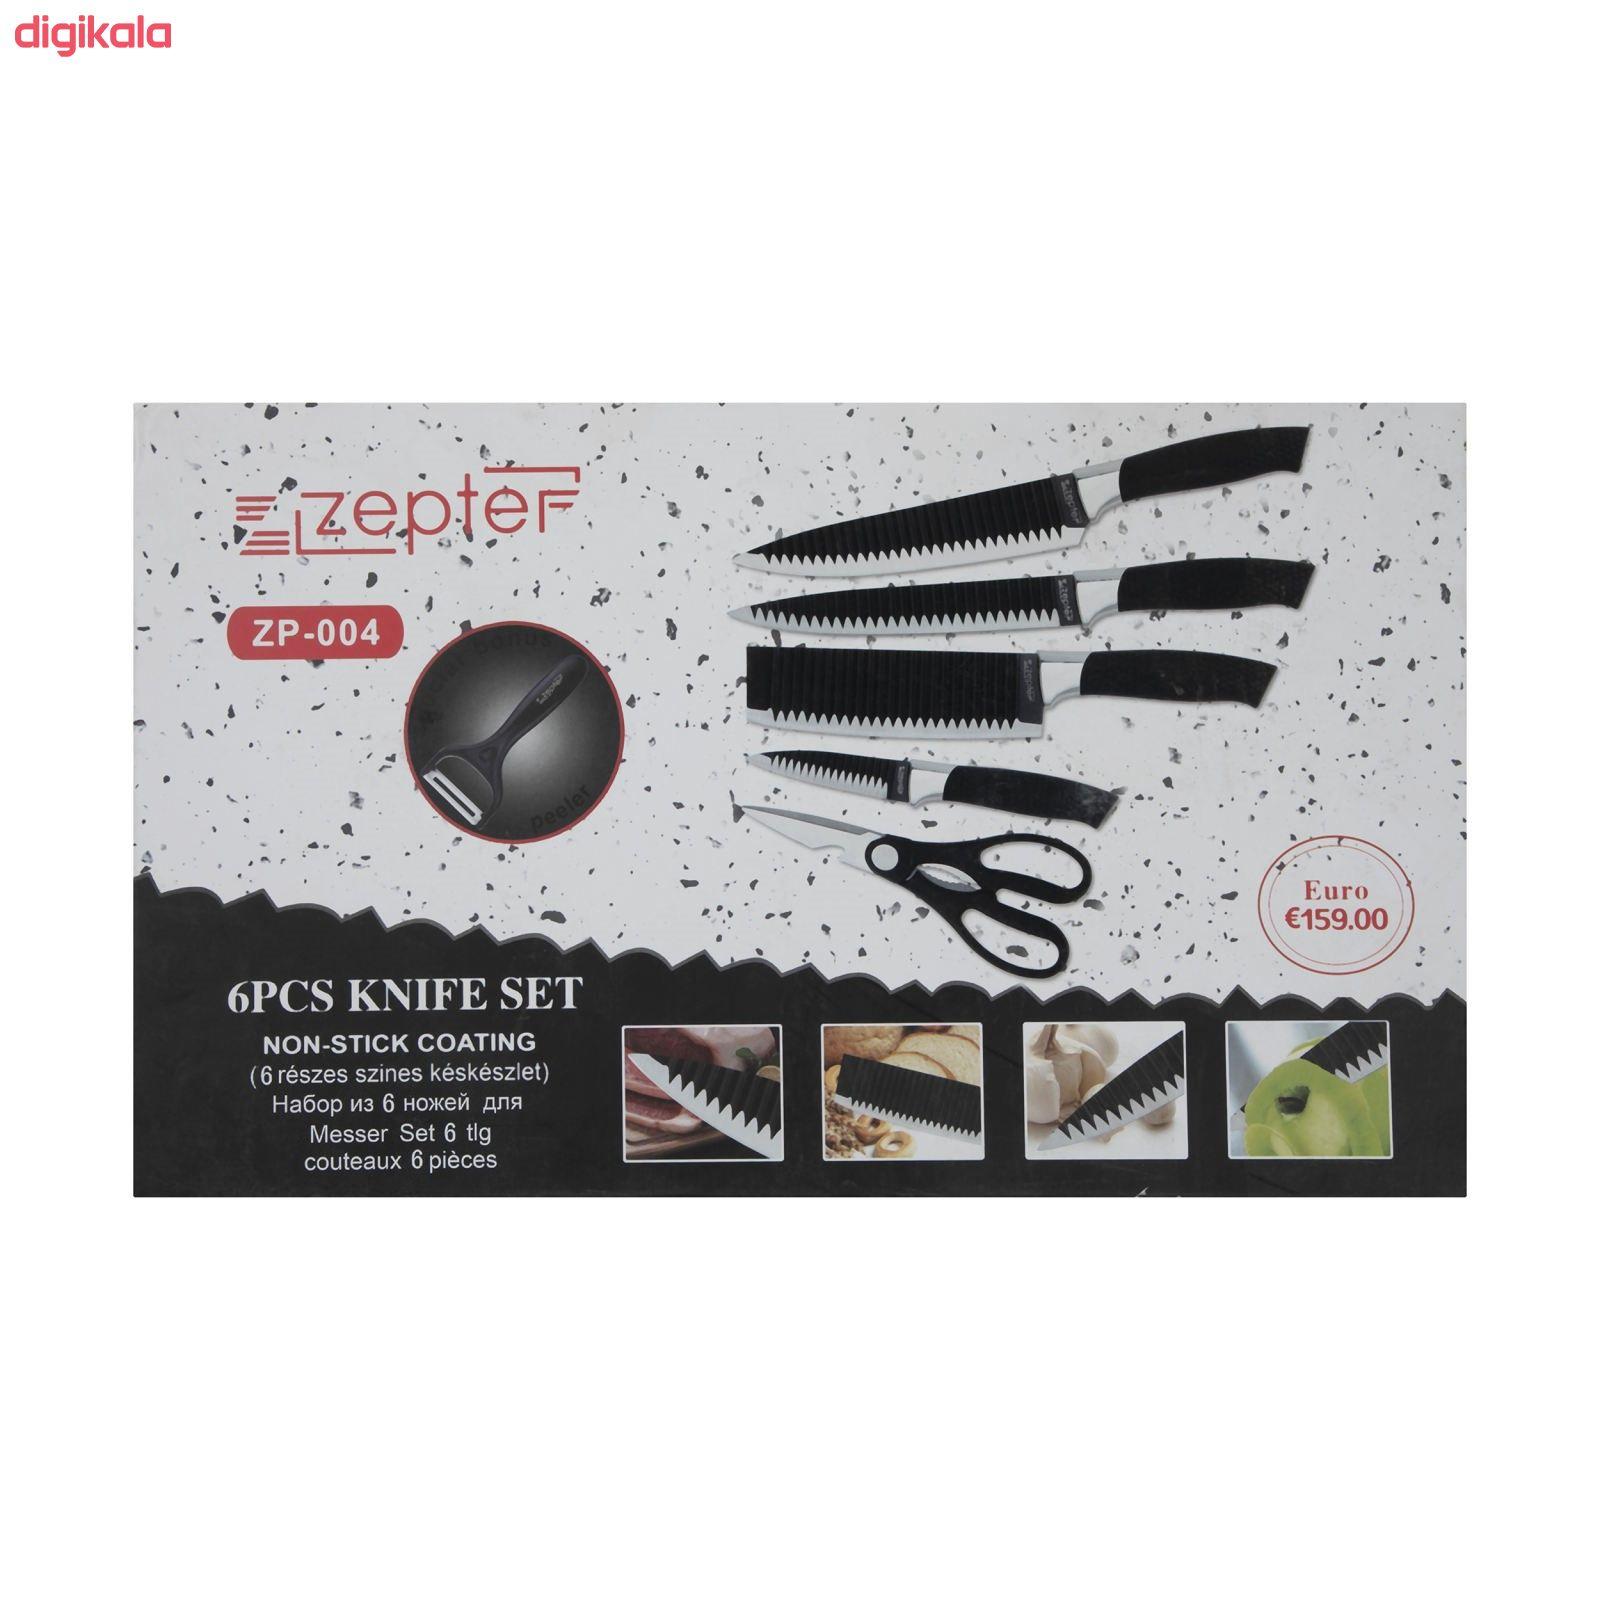 سرویس چاقو آشپزخانه 6 پارچه زپتف مدل ZP- 004 main 1 7